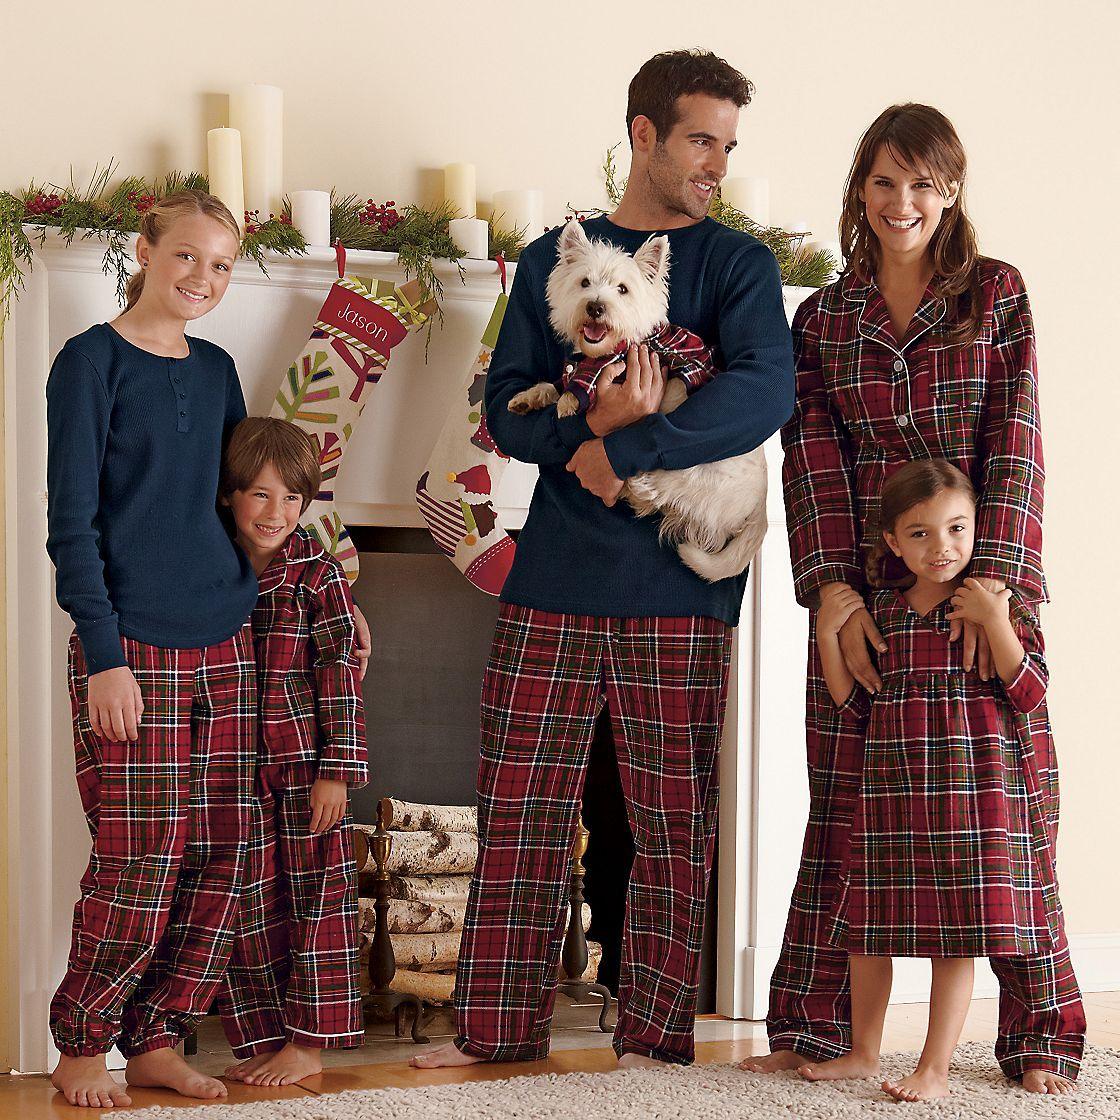 We always love to wear coordinating PJs on Christmas